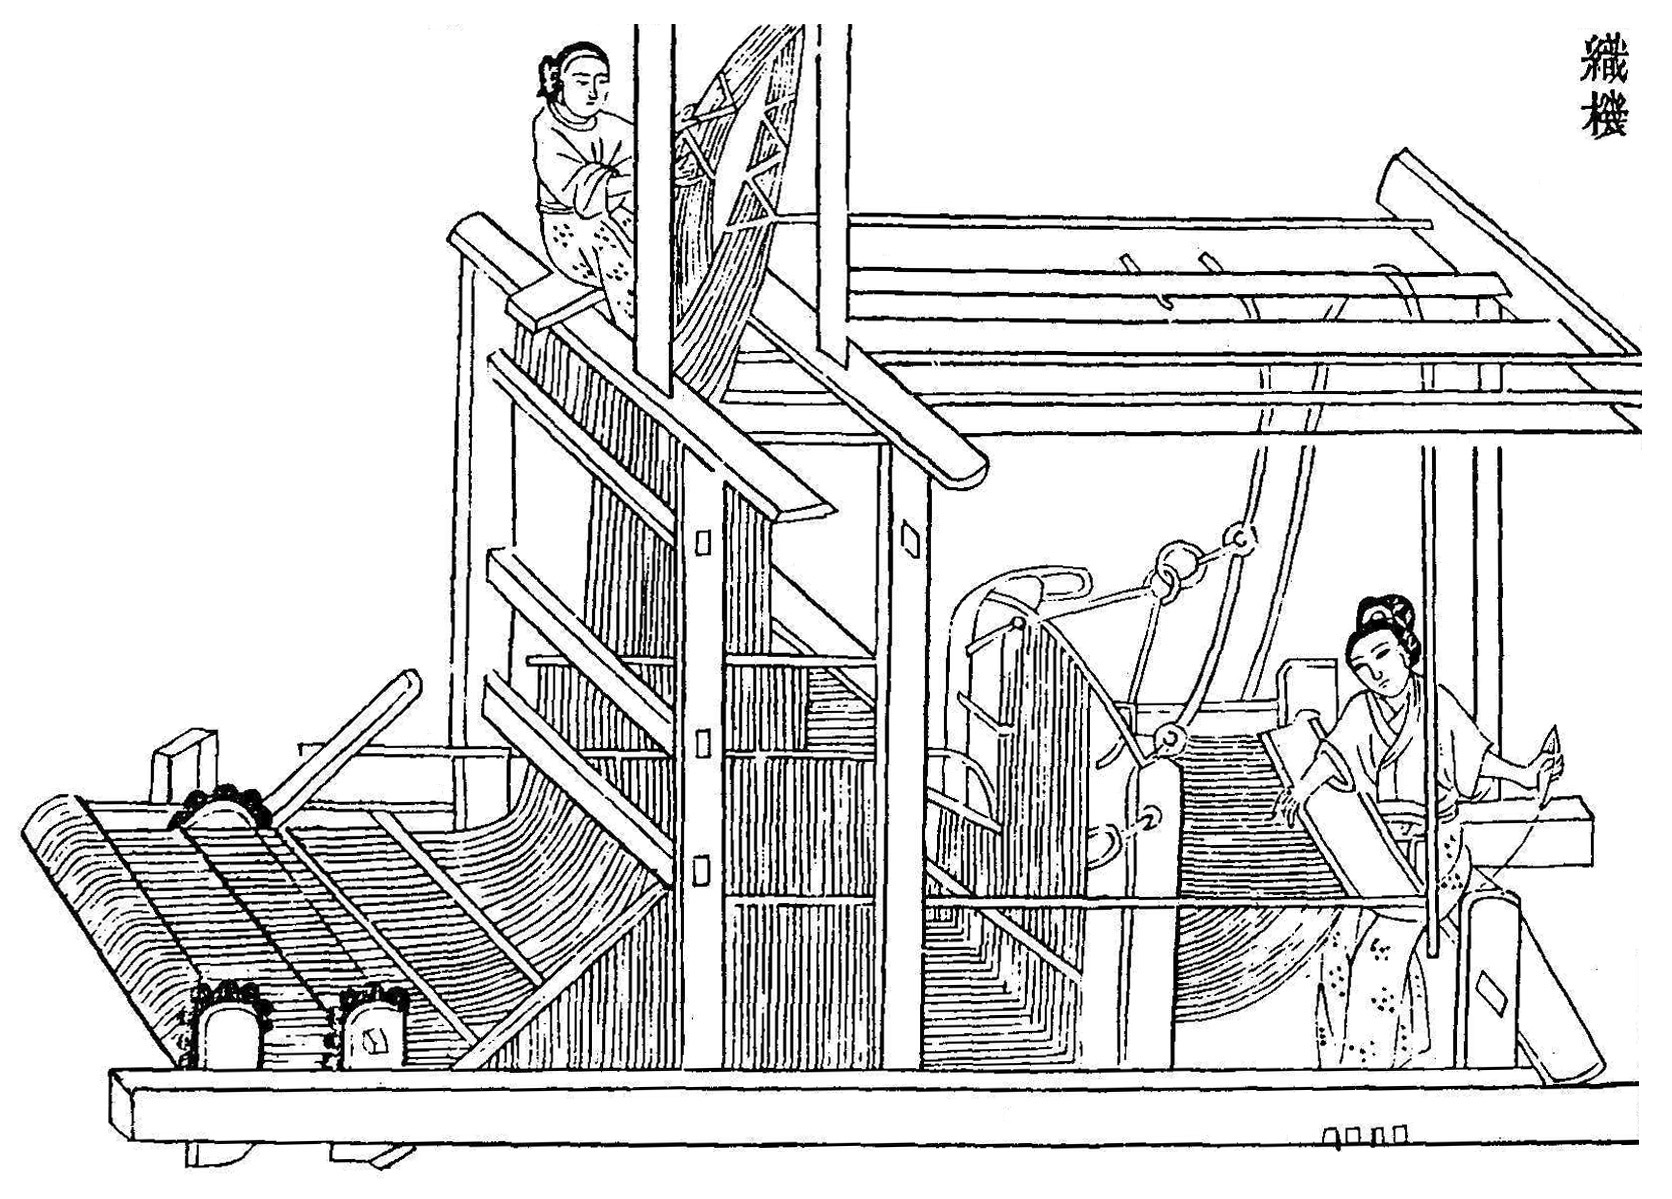 View 2021: Fiber, Loom and Technique